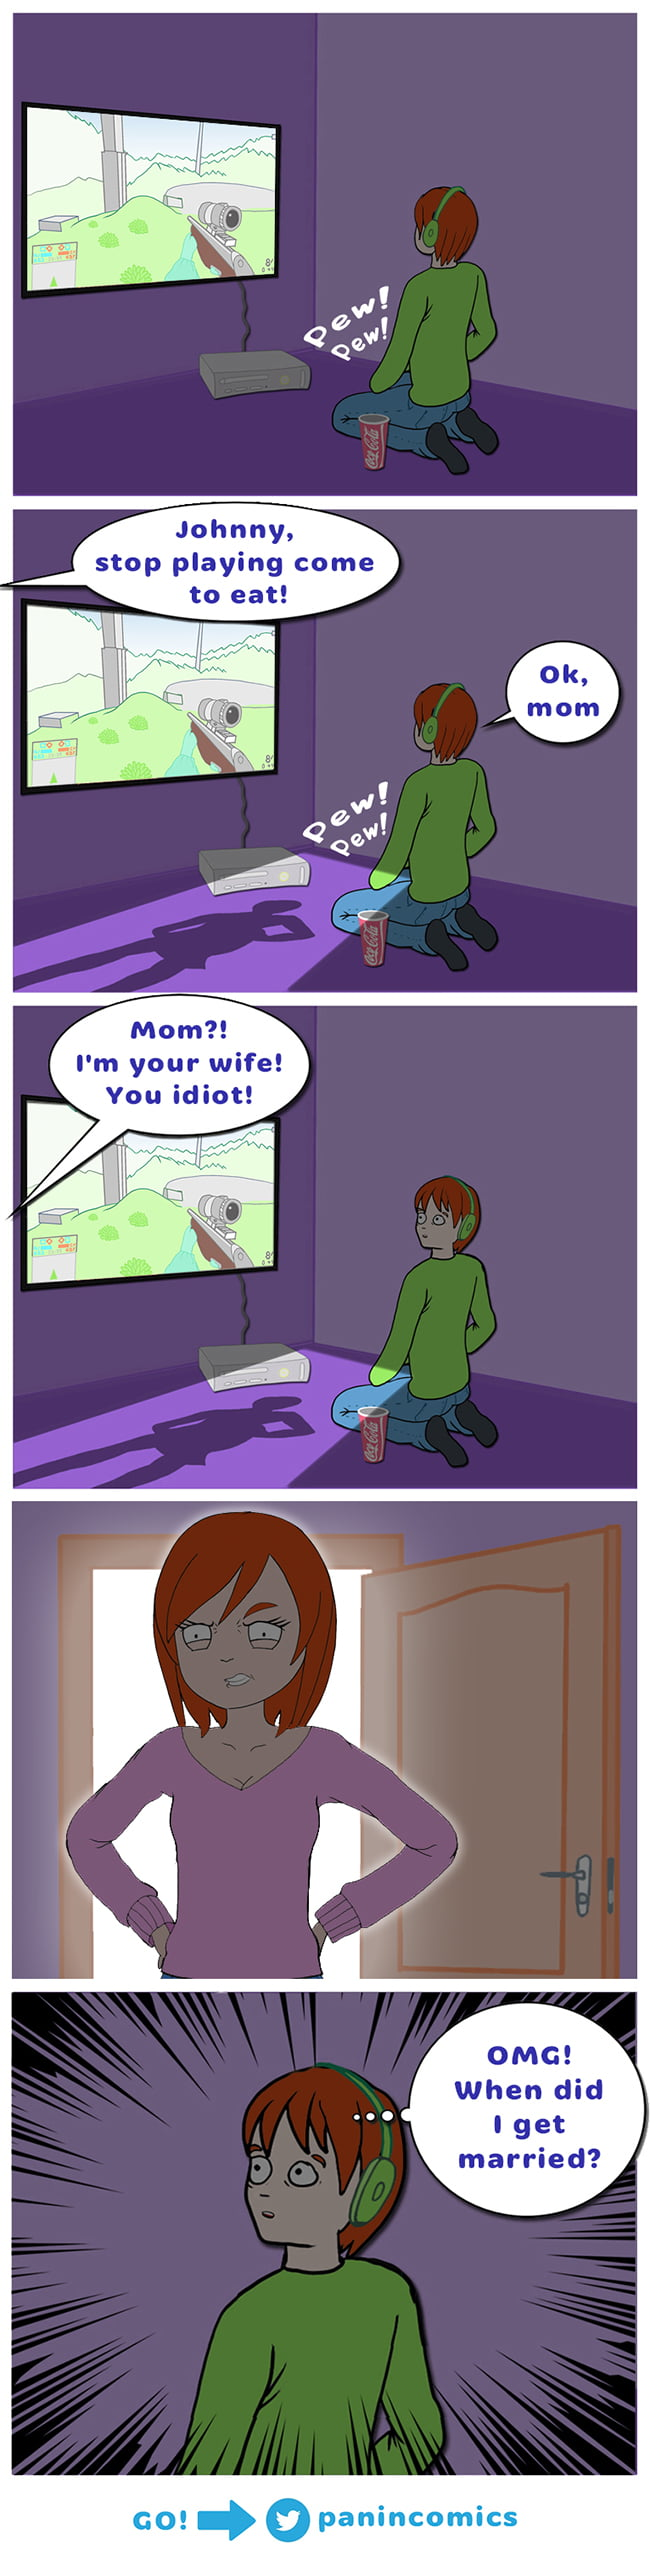 Heh, Gamers will understand